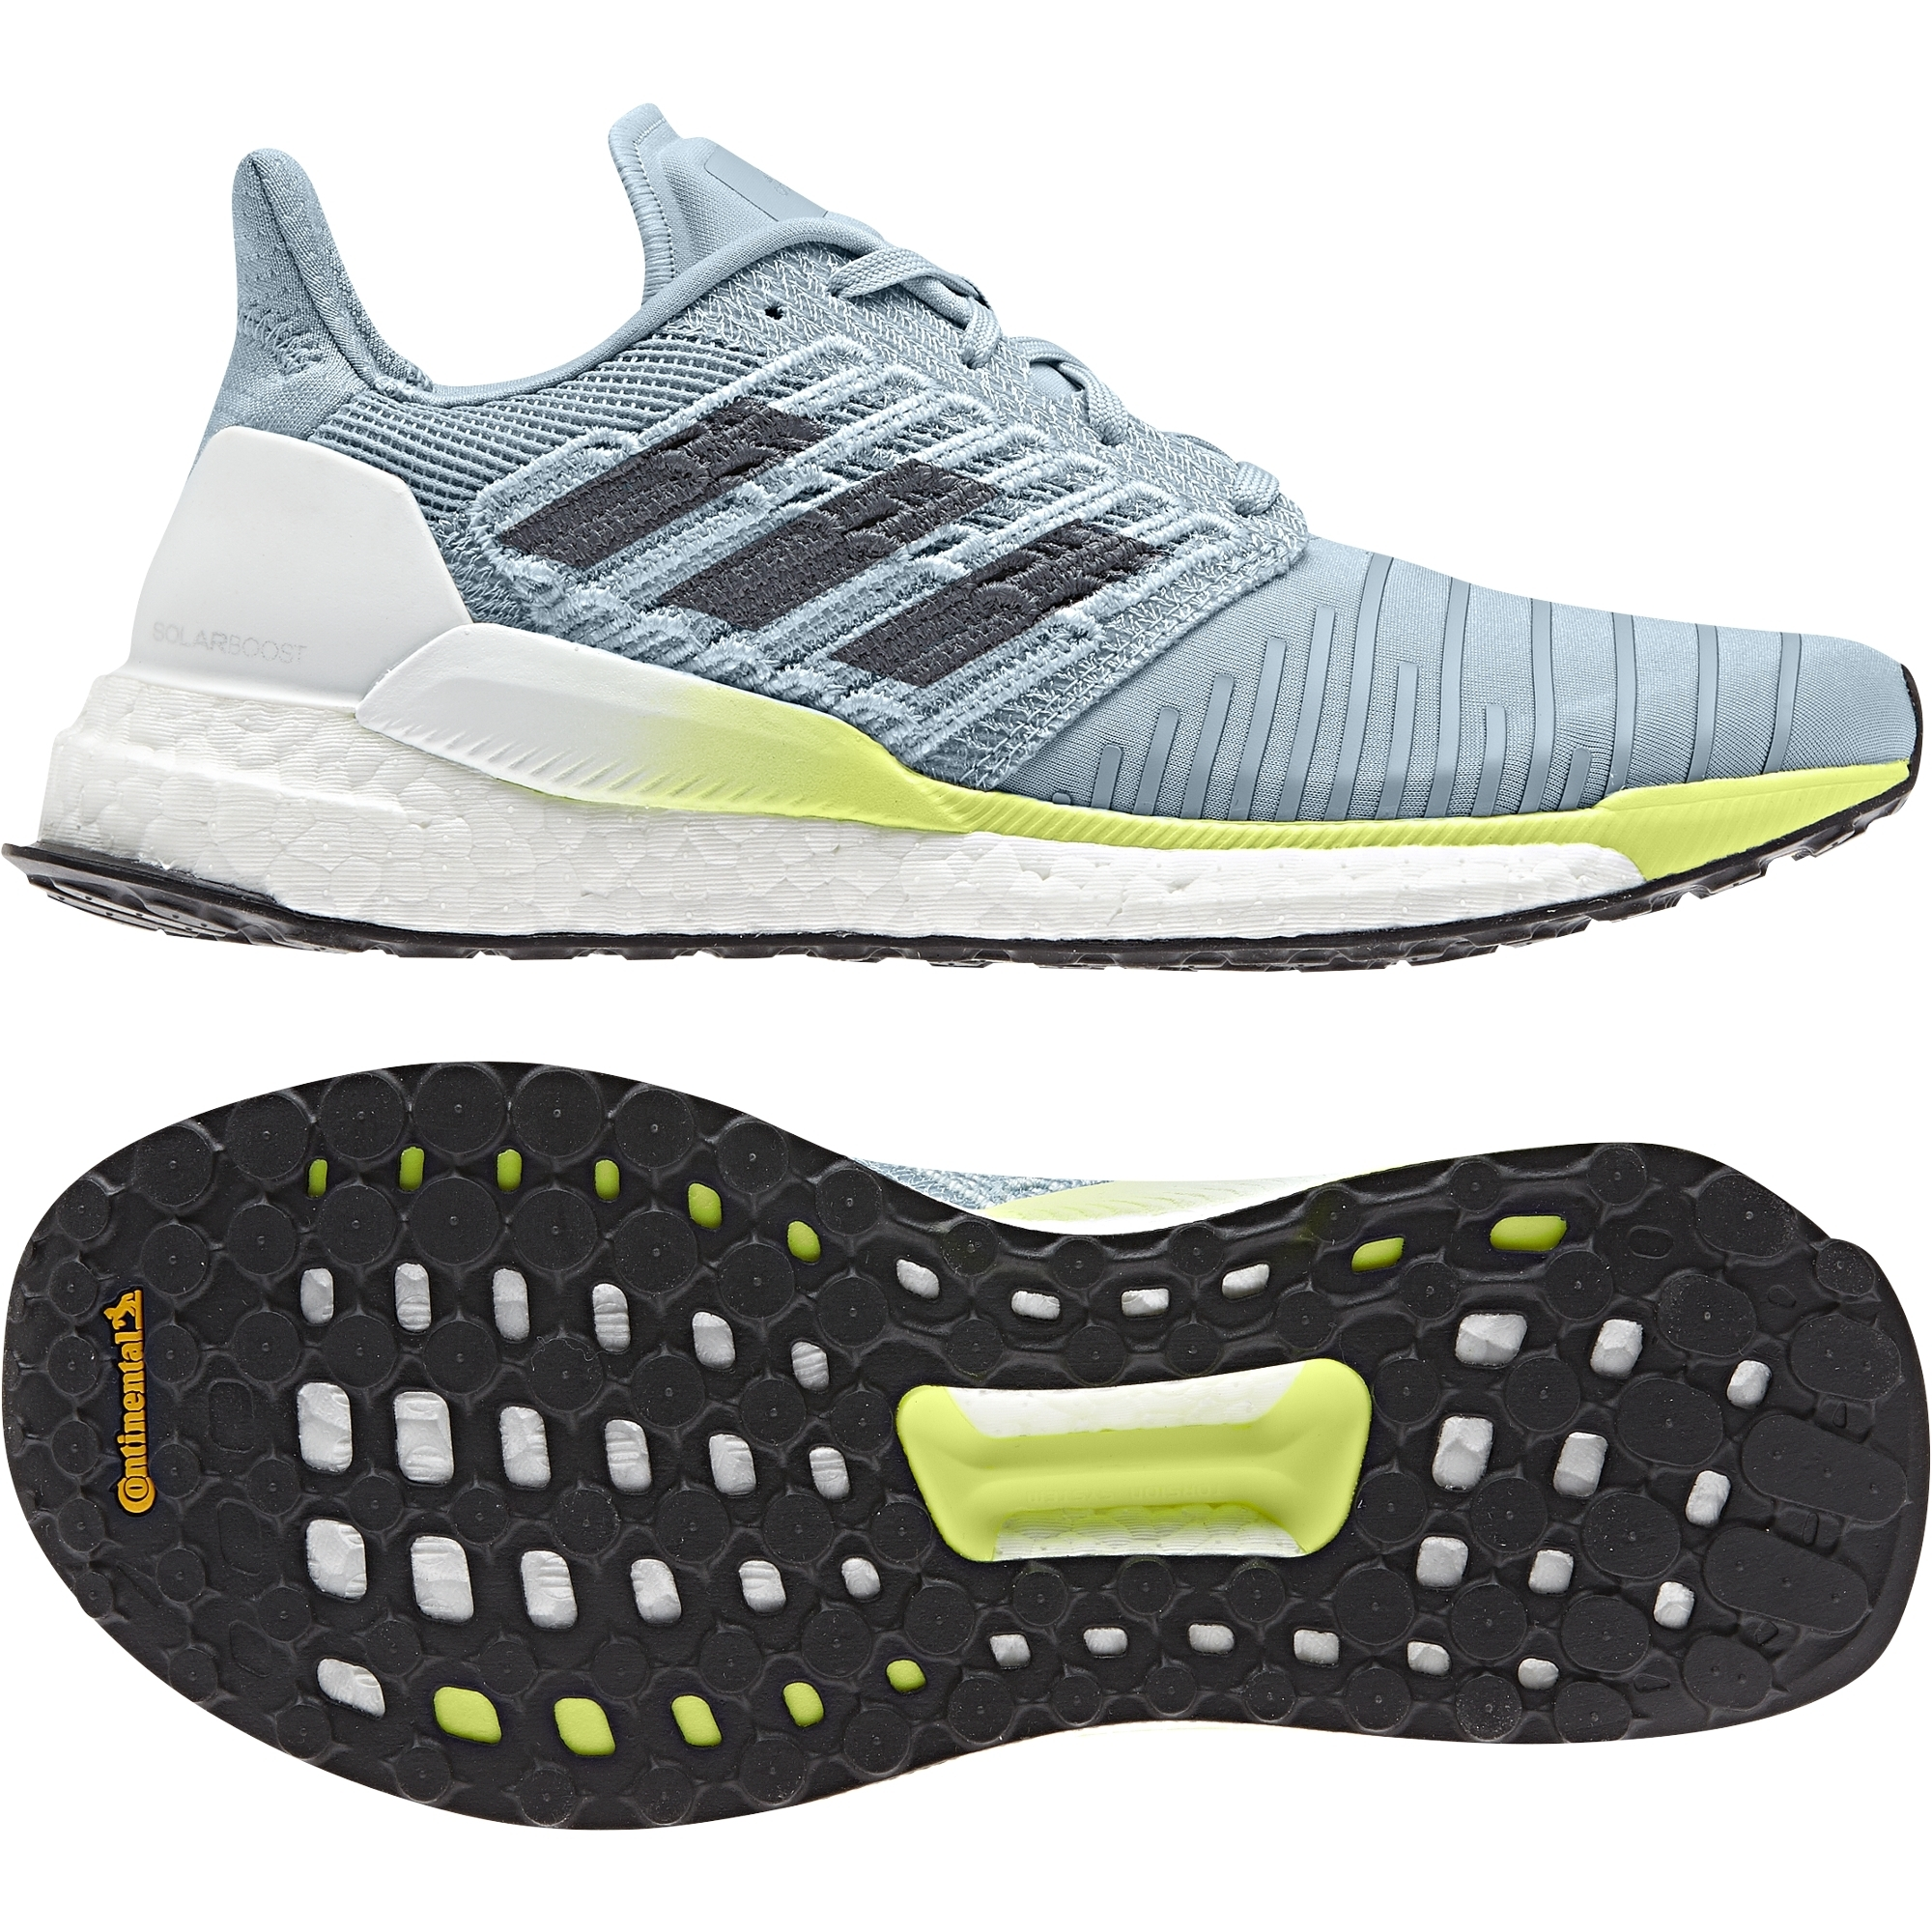 Laufschuh Sportschuh Adidas Solar Boost Gr. 41 13 in